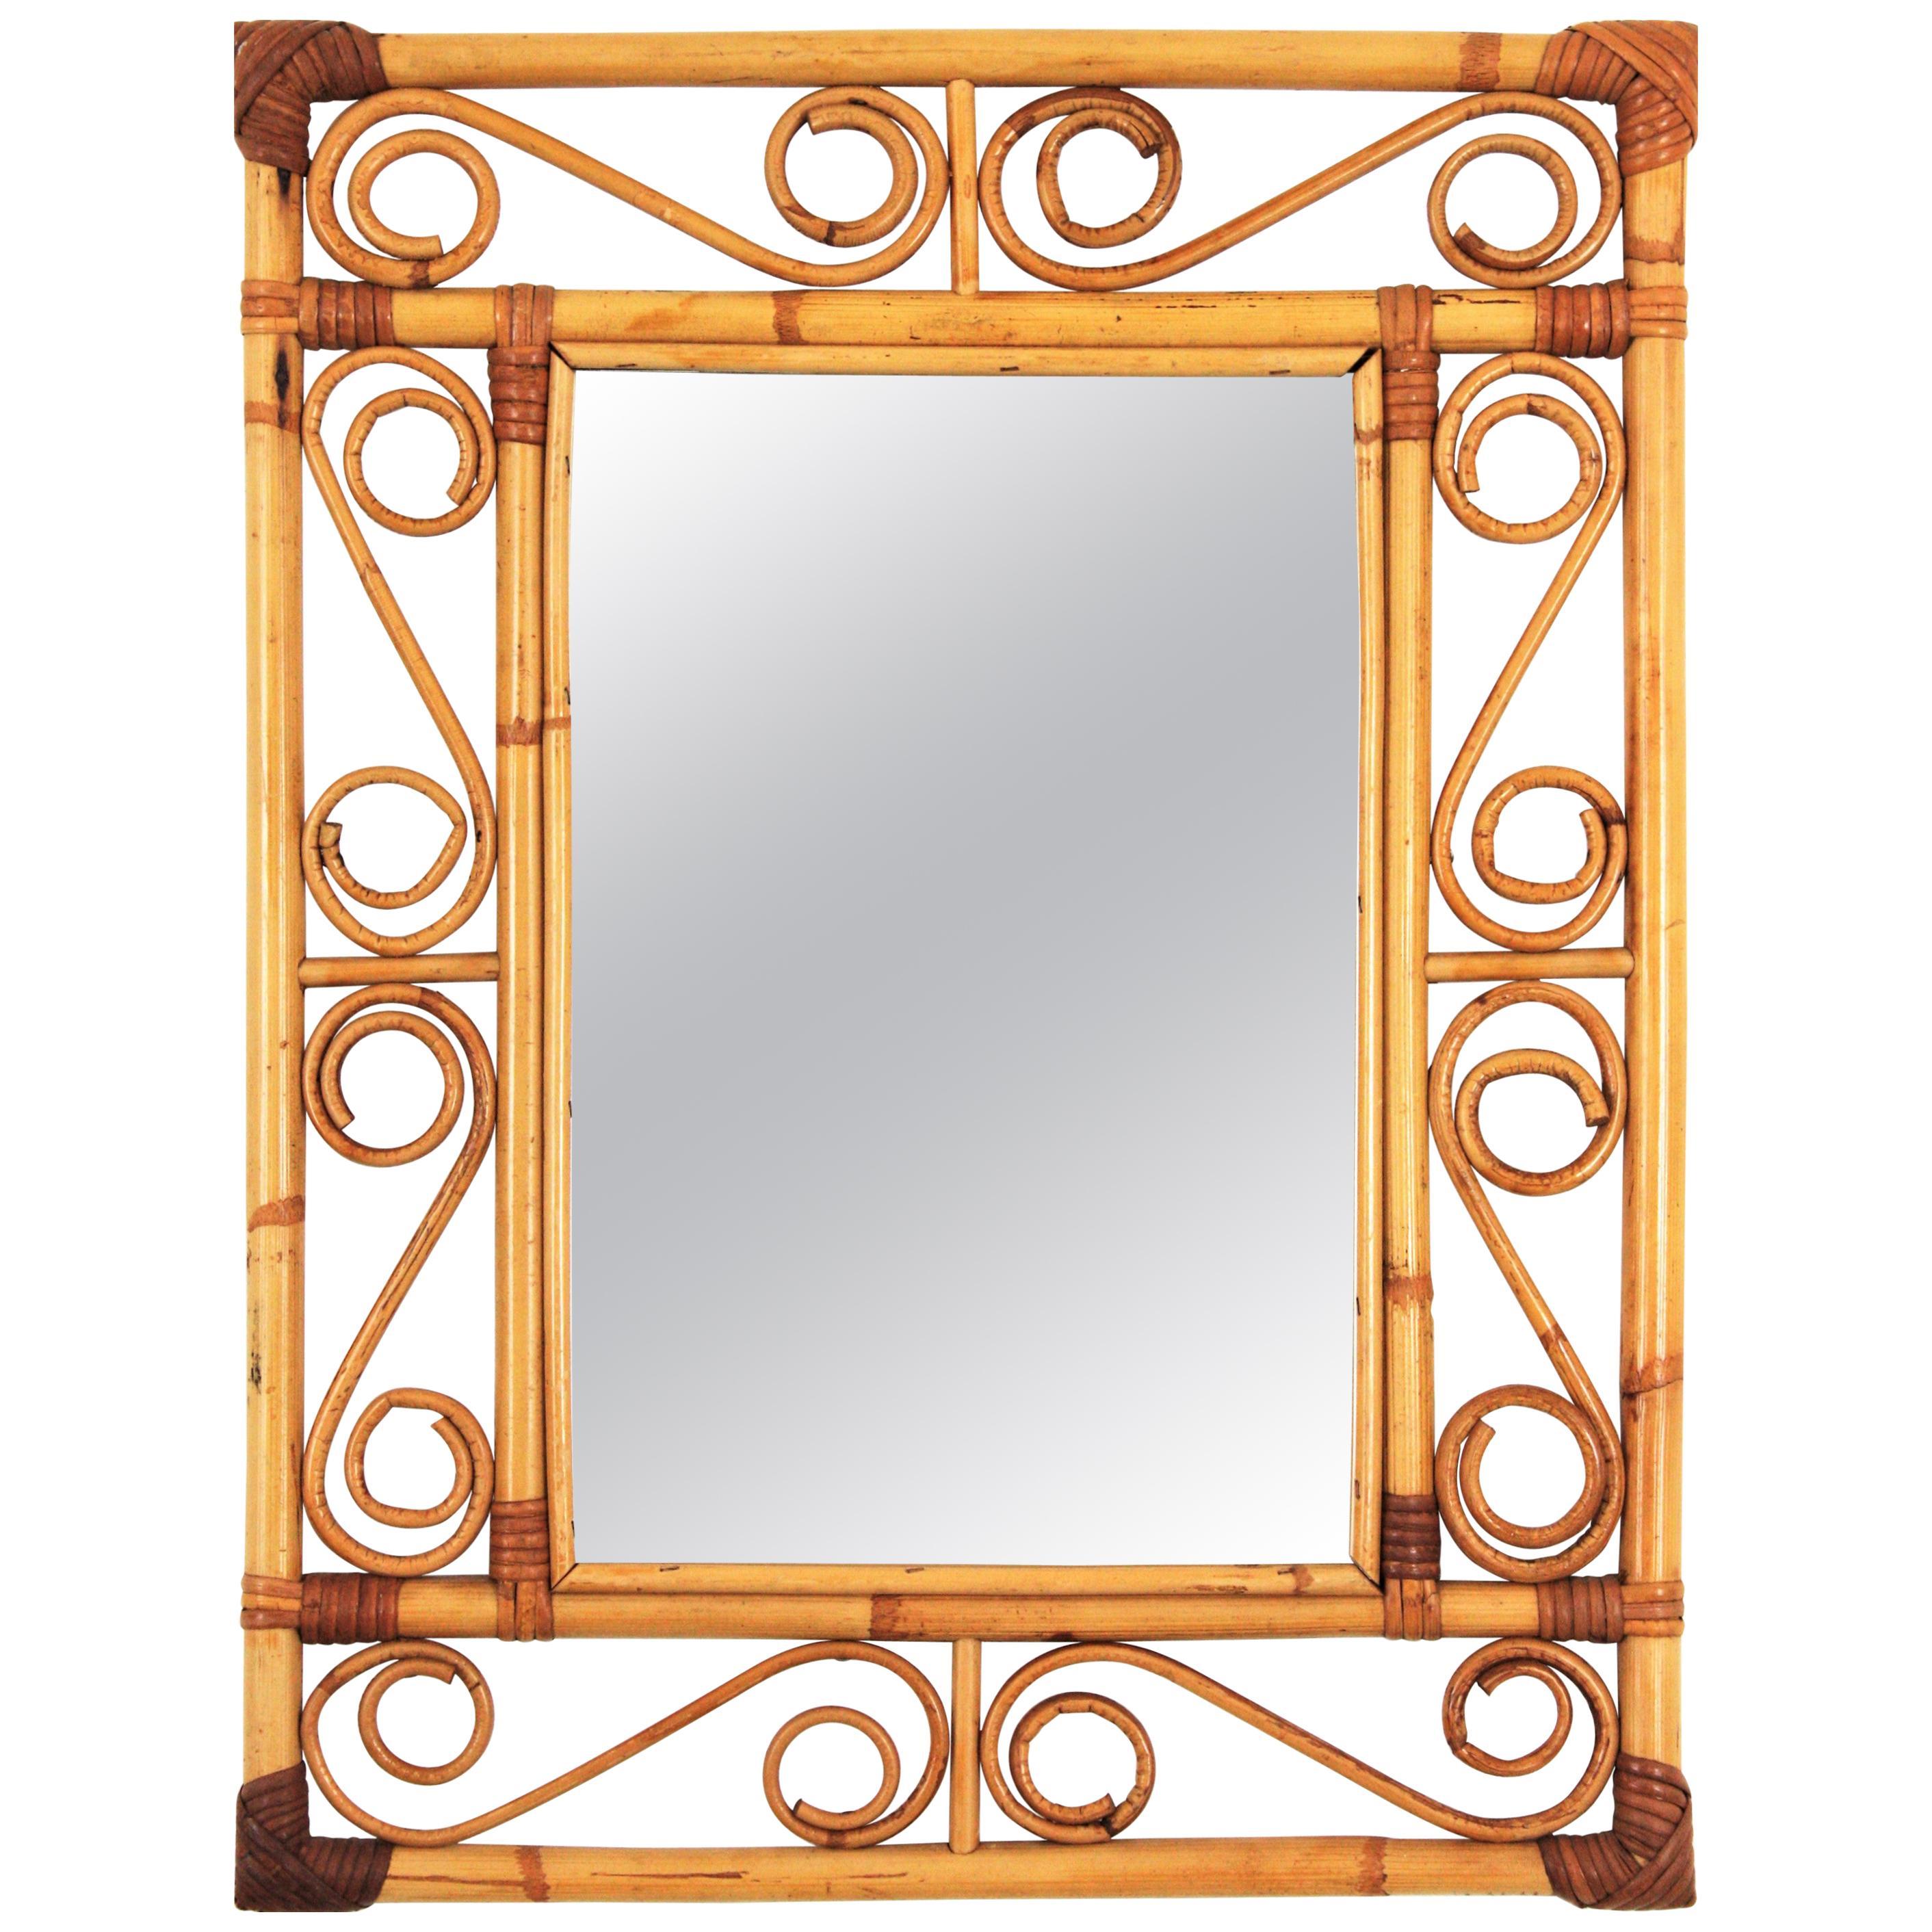 Franco Albini Style Bamboo and Rattan Rectangular Mirror with Scroll Motif